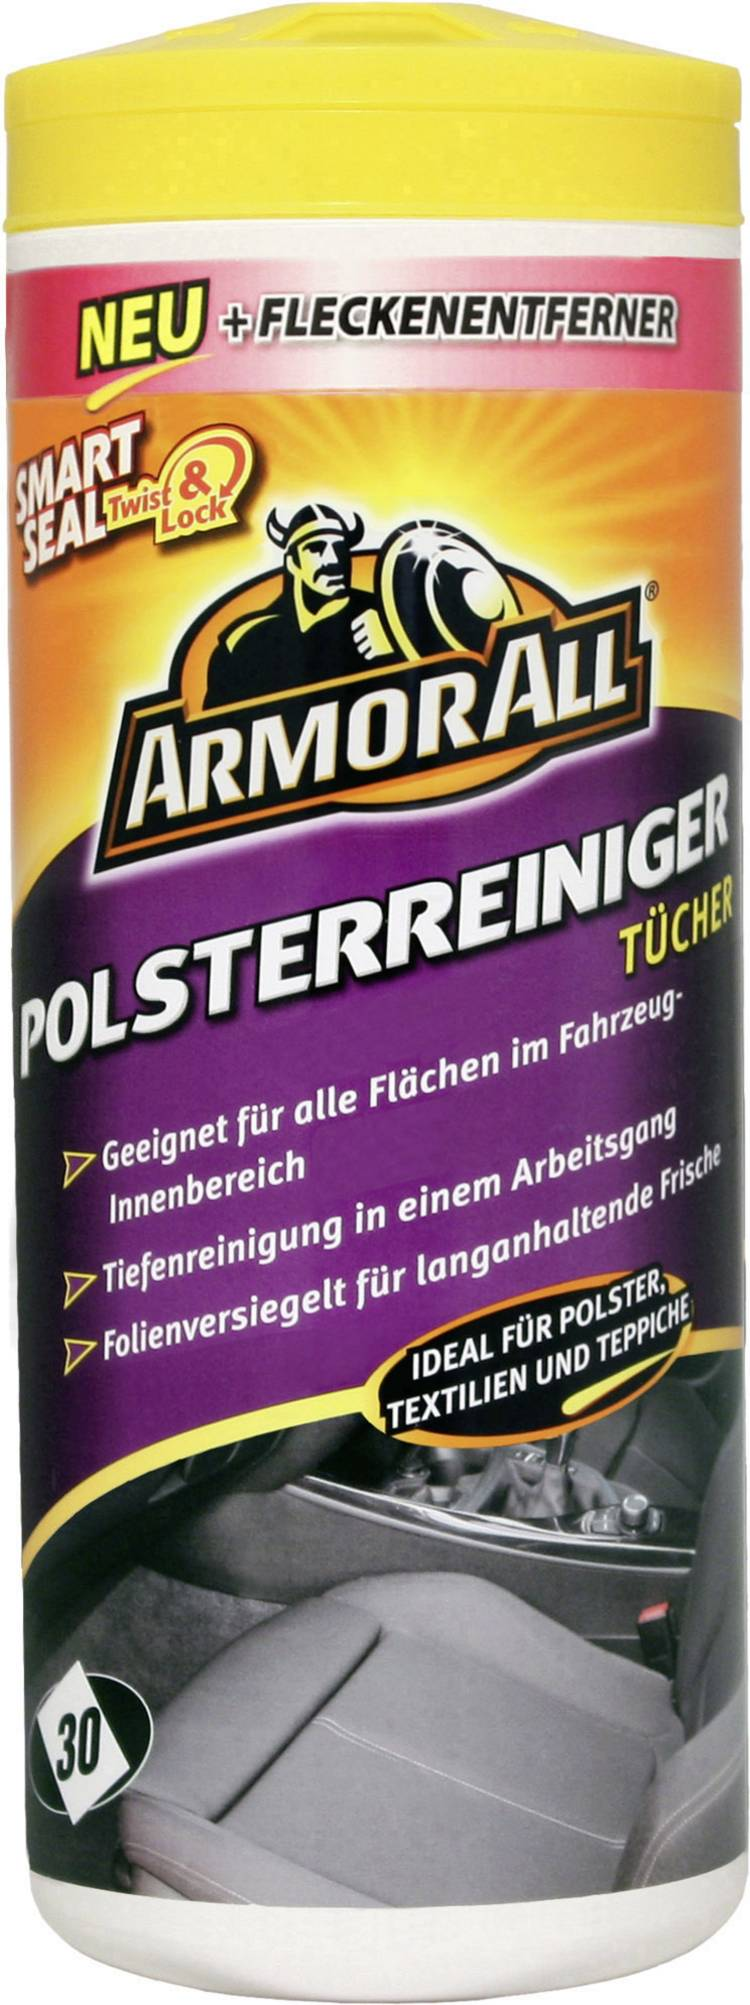 ArmorAll 38025L 30 stuks